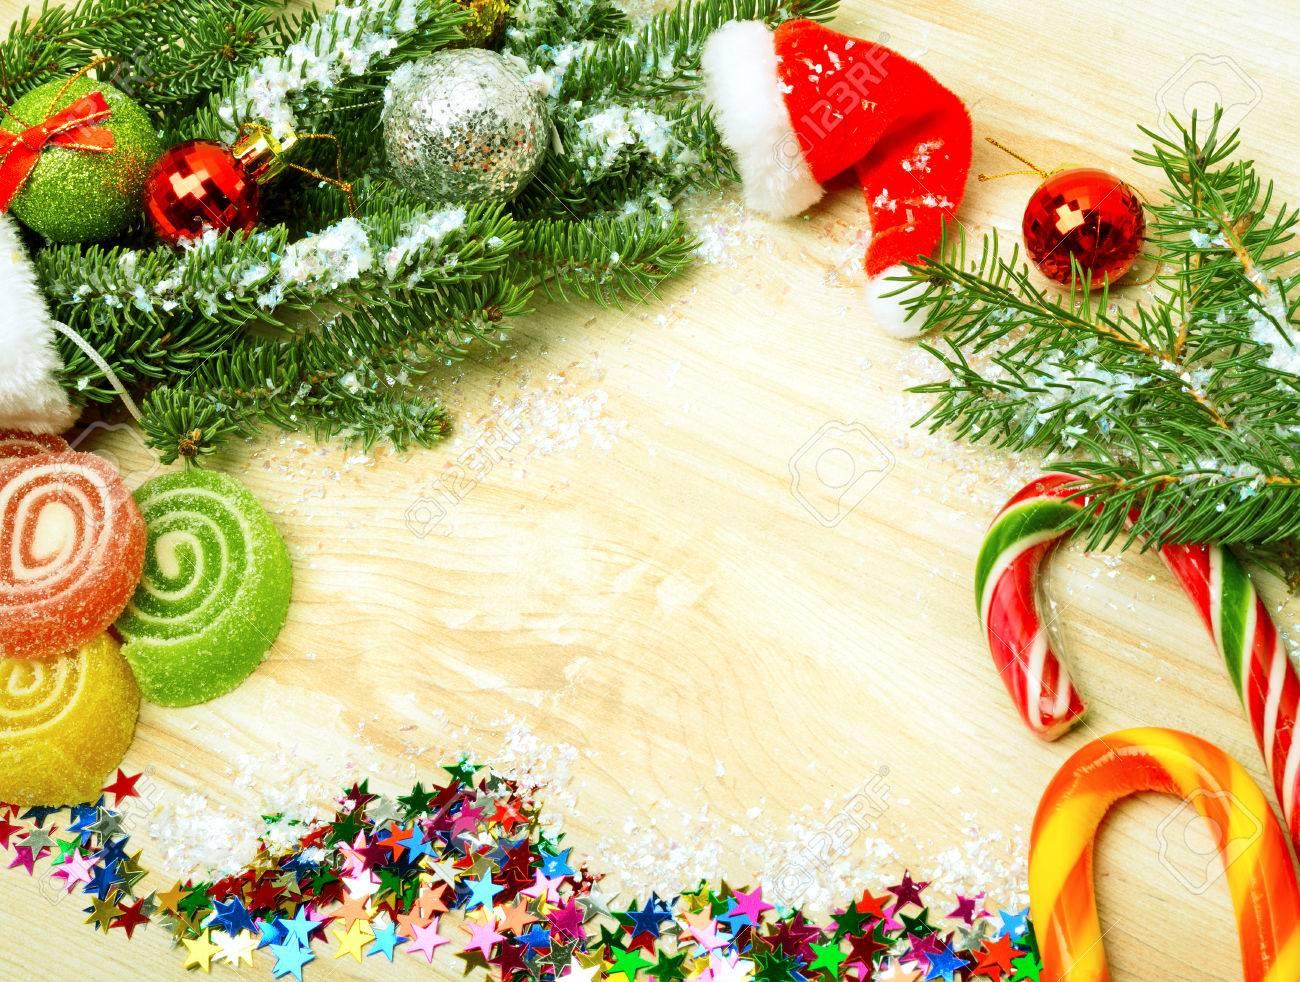 Christmas background, lollipops, pine twig, sweets, jellies - 67644195